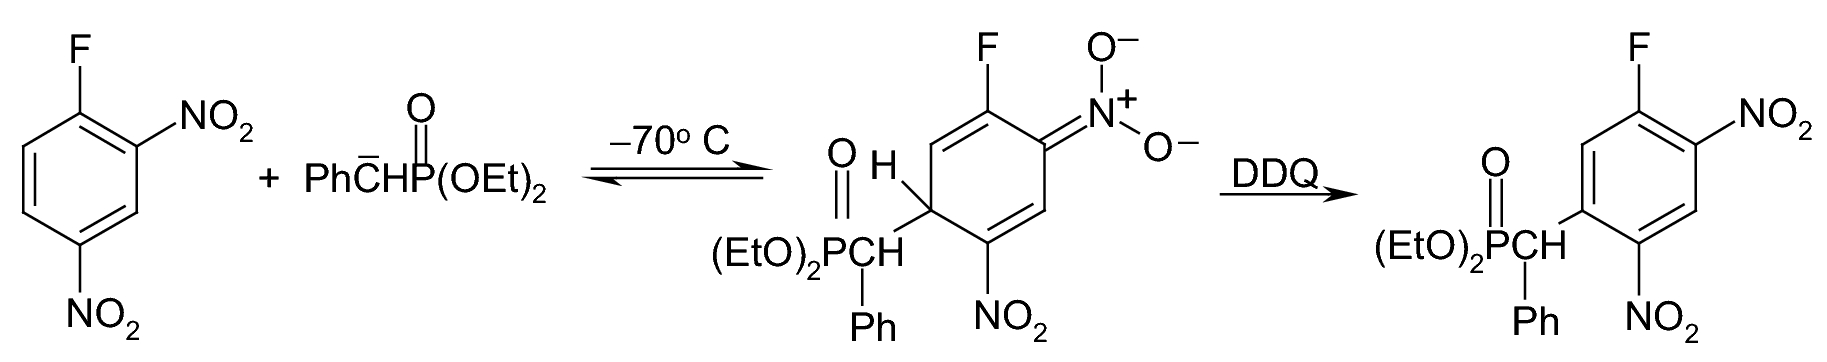 Nucleophilic substitution in nitroarenes: a general